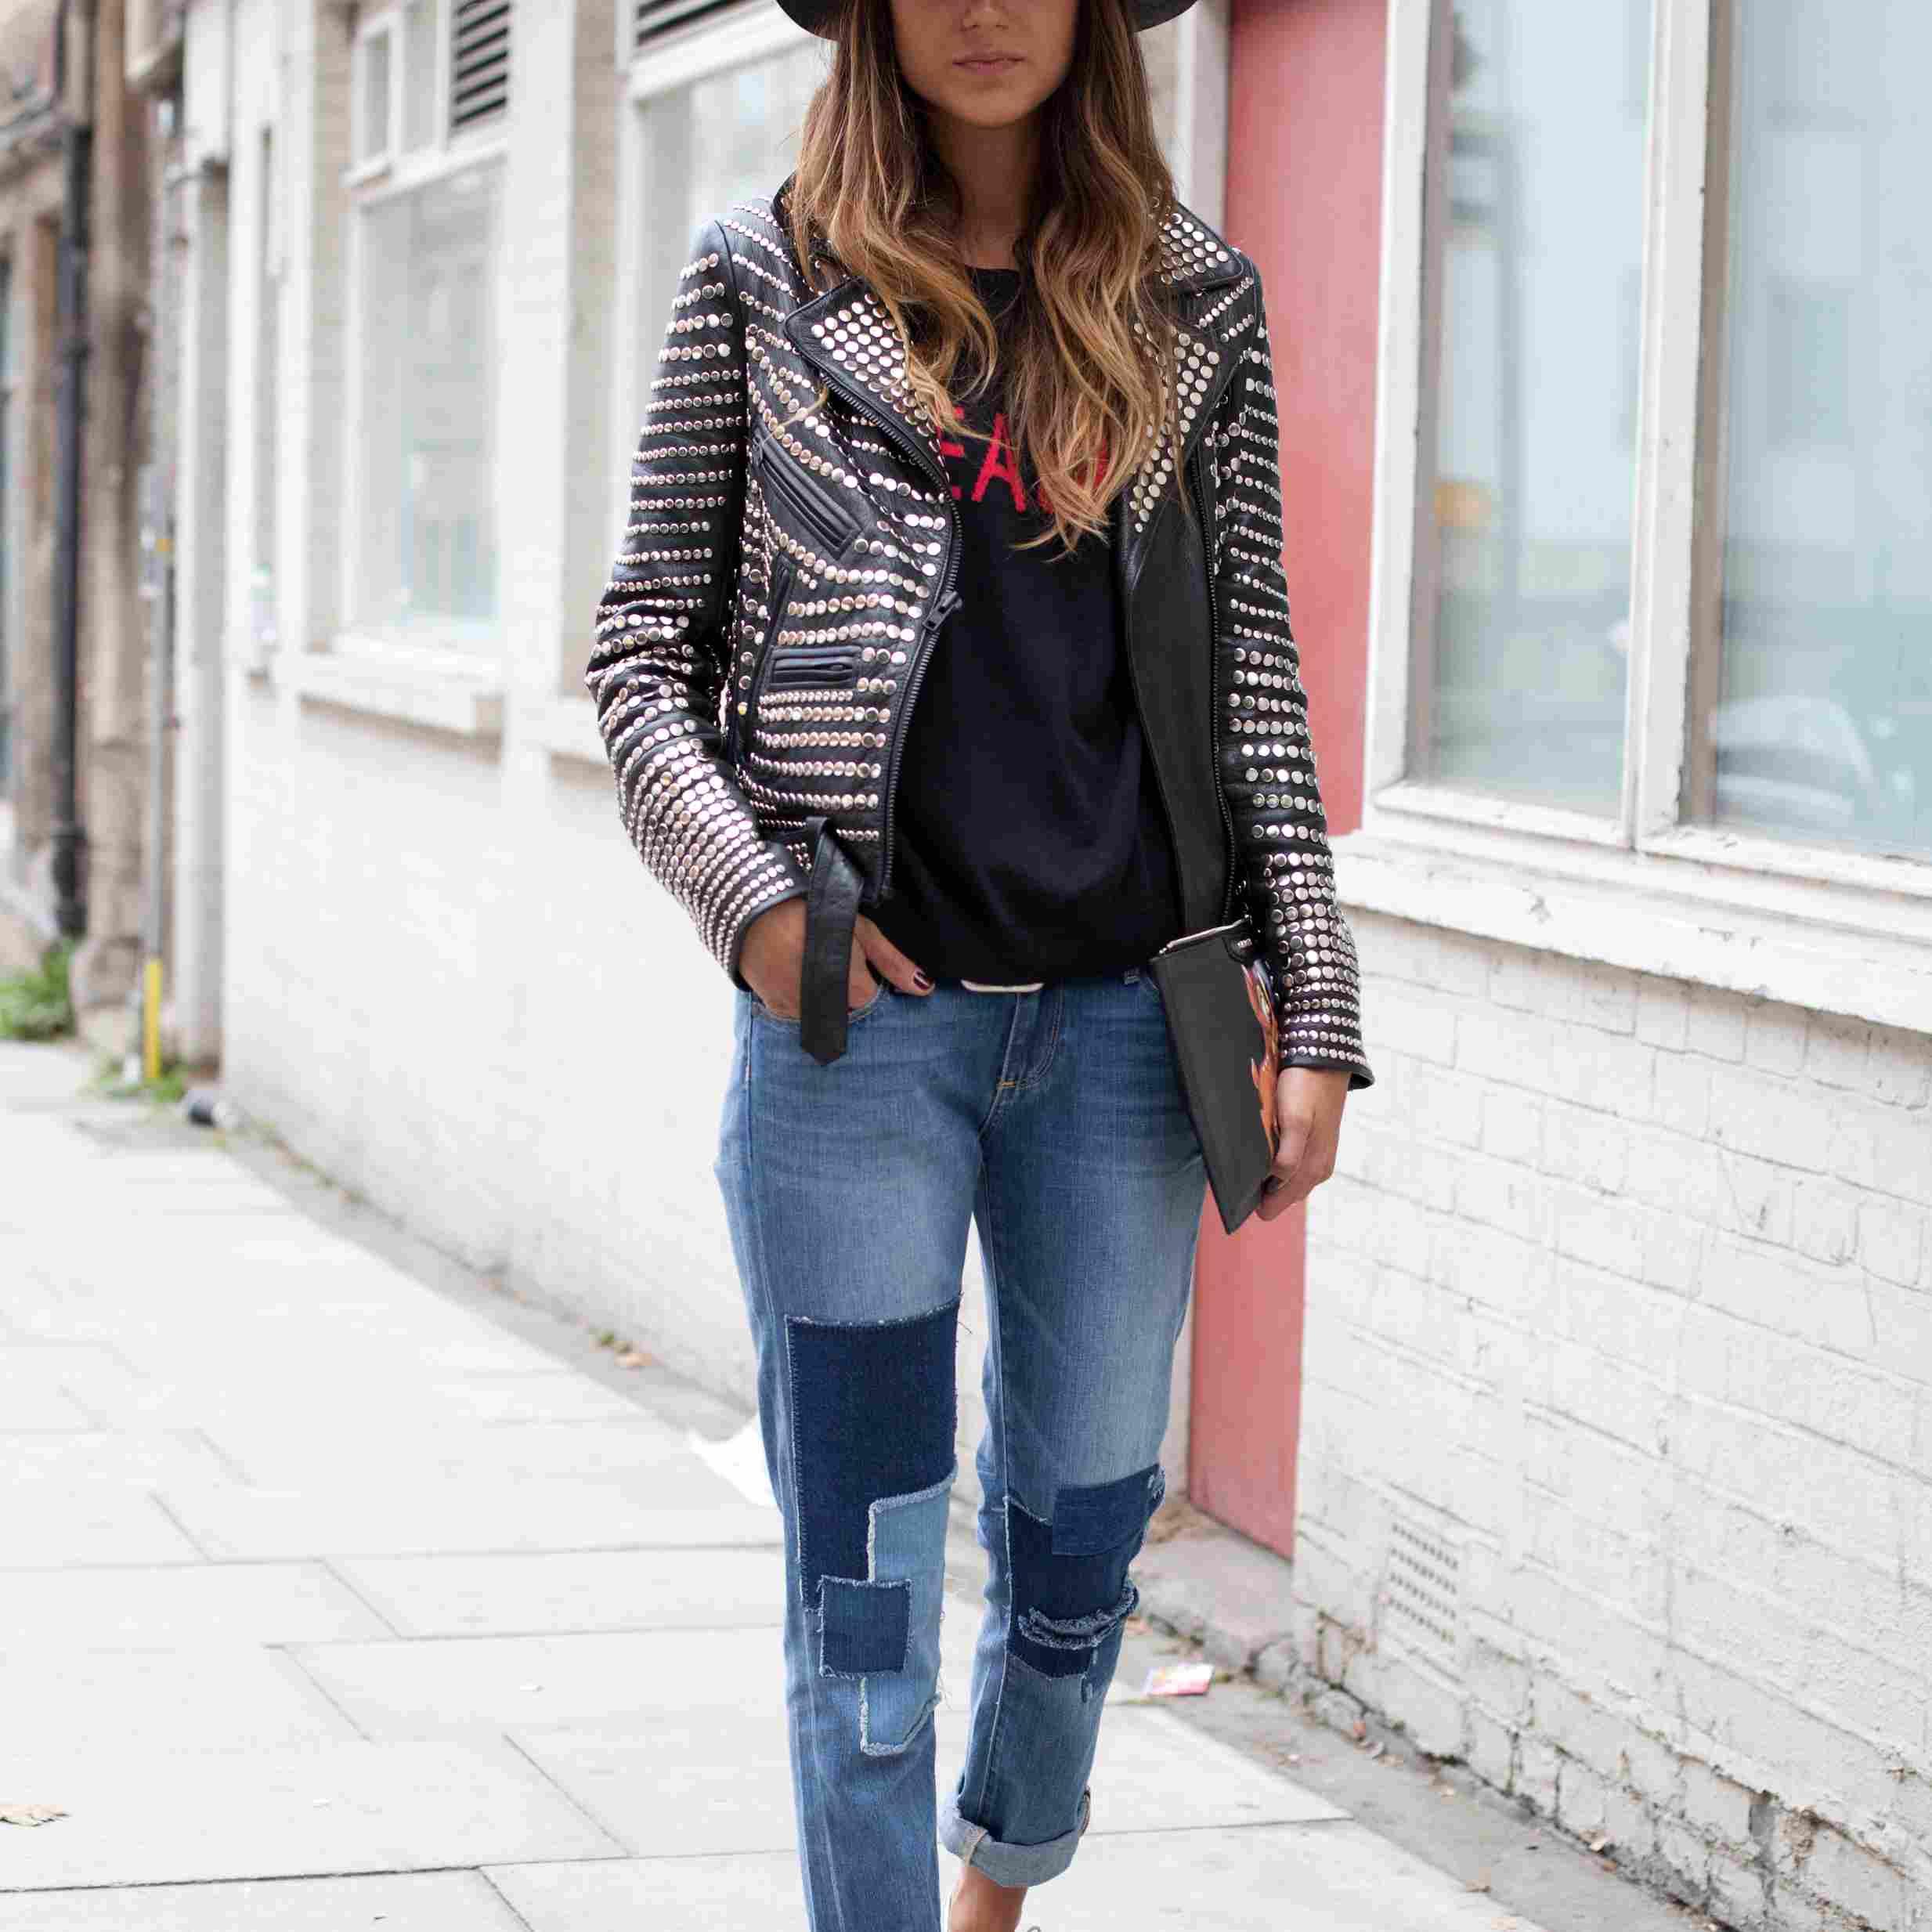 Fashion-blogger-Soraya-Bakhtiar-Paige-jeans-A.L.C-jacket-Kirstin-Sinclair.jpg